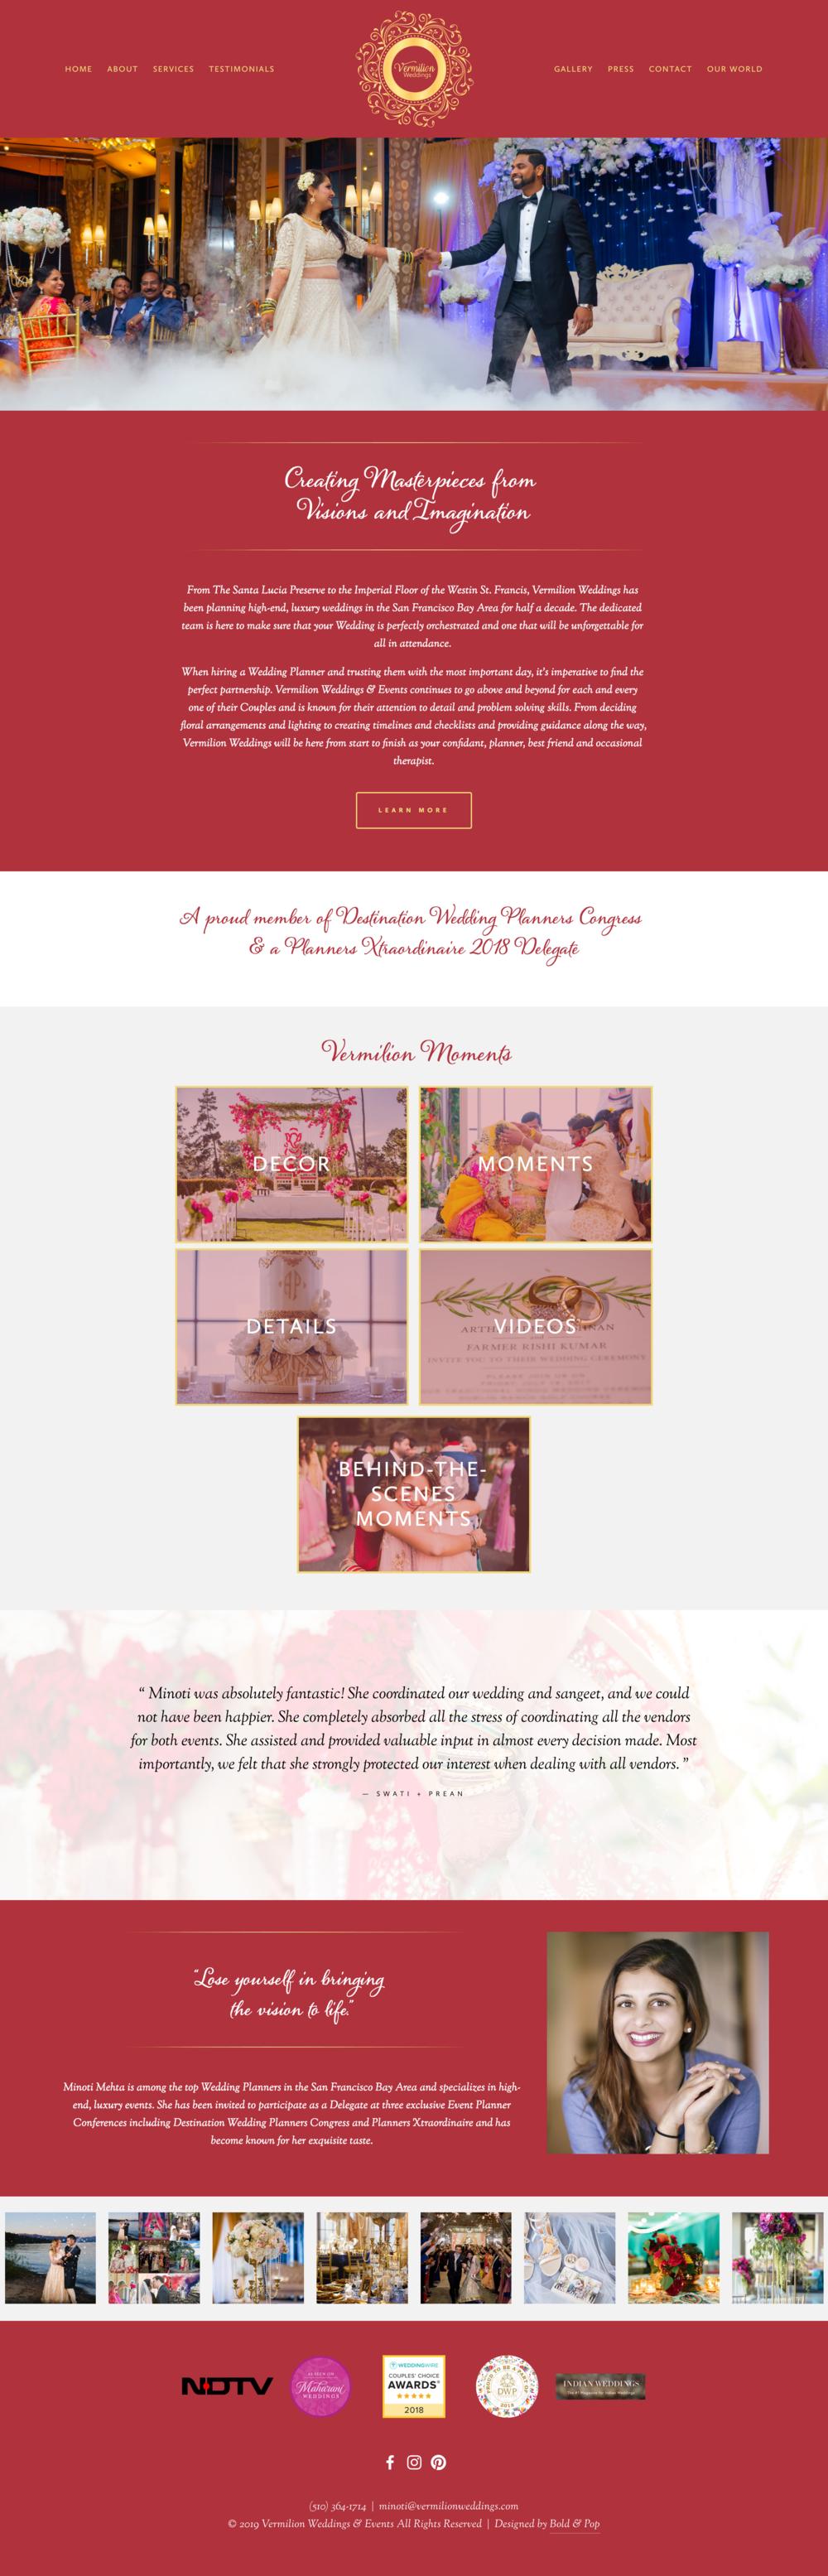 Wedding & Events Planner Website Design